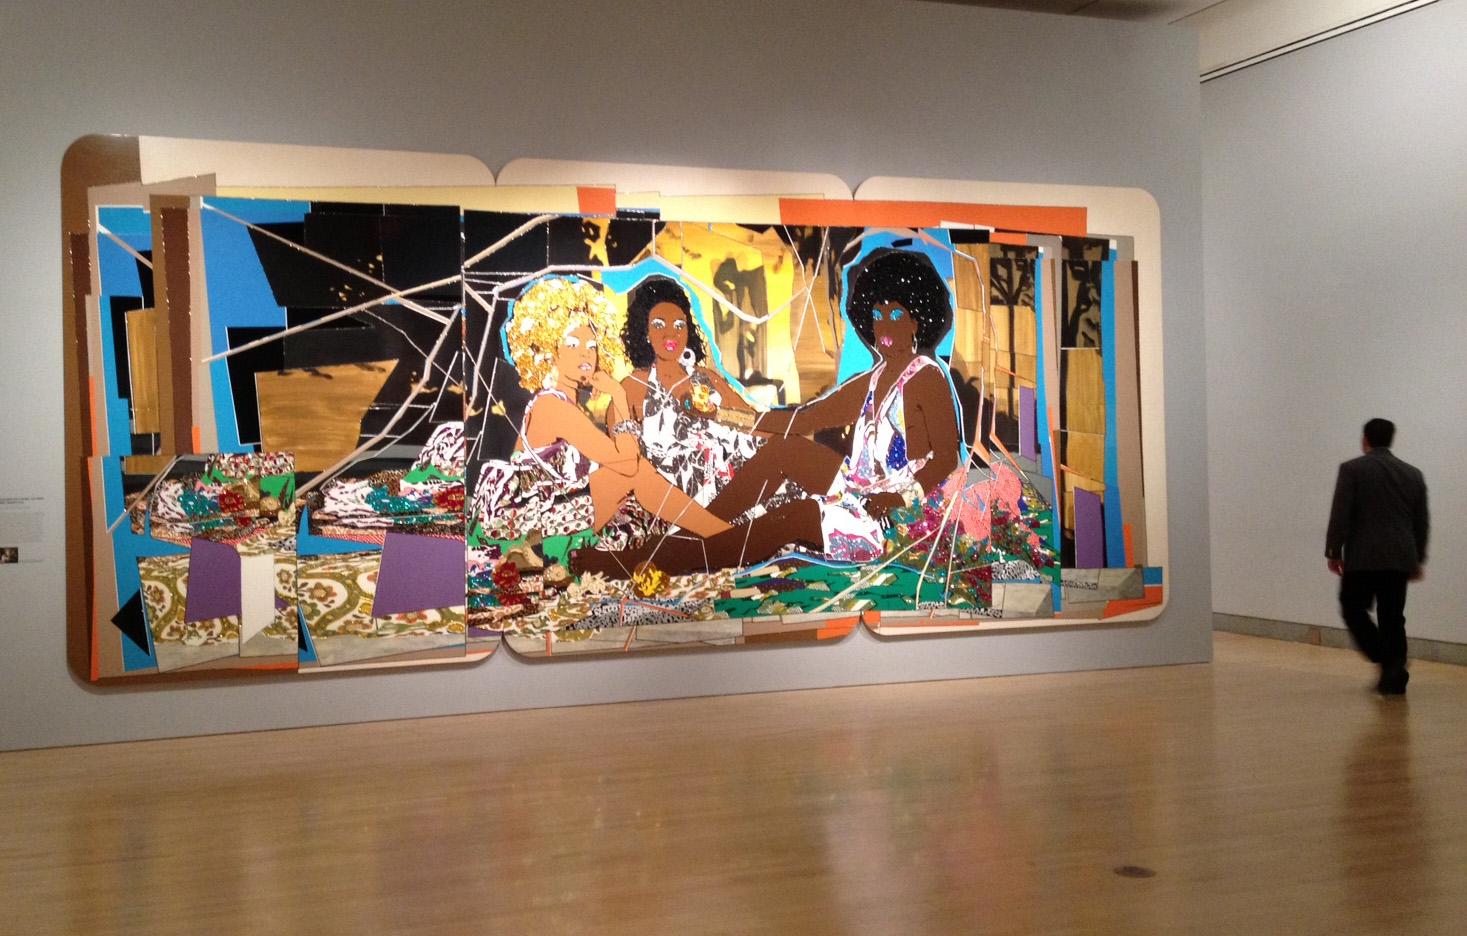 Alexandria Museum of Art, Kara Walker, Beyond Mammy Jezebel & Sapphire, Mickalene Thomas, Alison Saar, African American Art, Black Art, Black Feminist, KOLUMN Magazine, KOLUMN